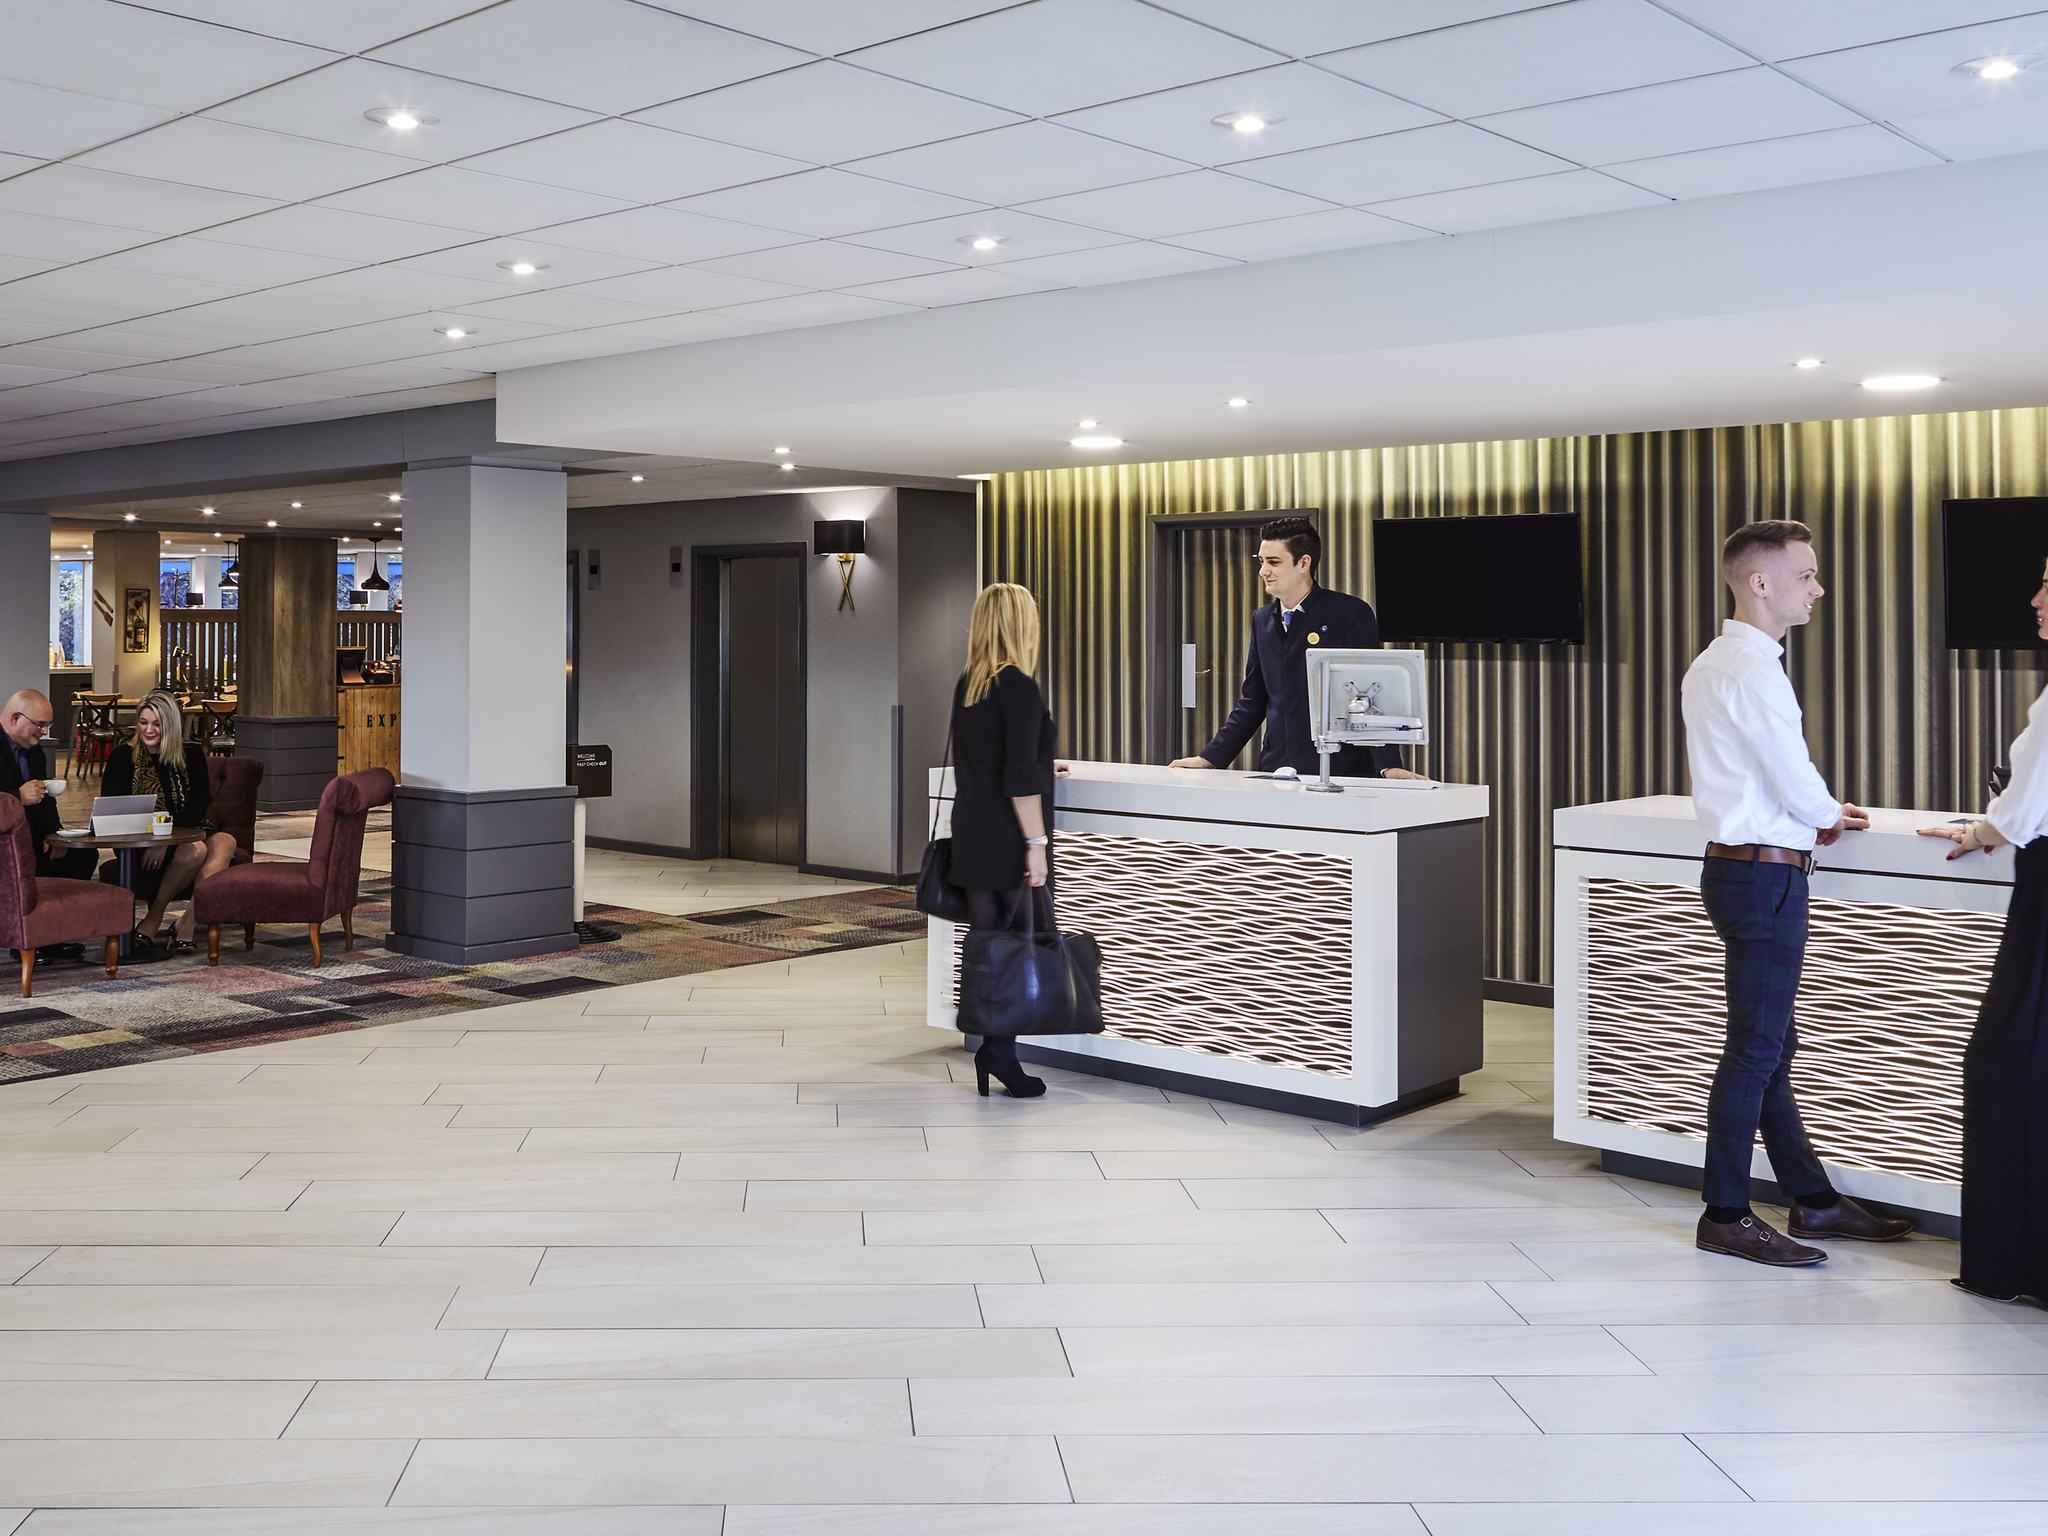 Novotel Wolverhampton Spacious Hotel In Wolverhampton